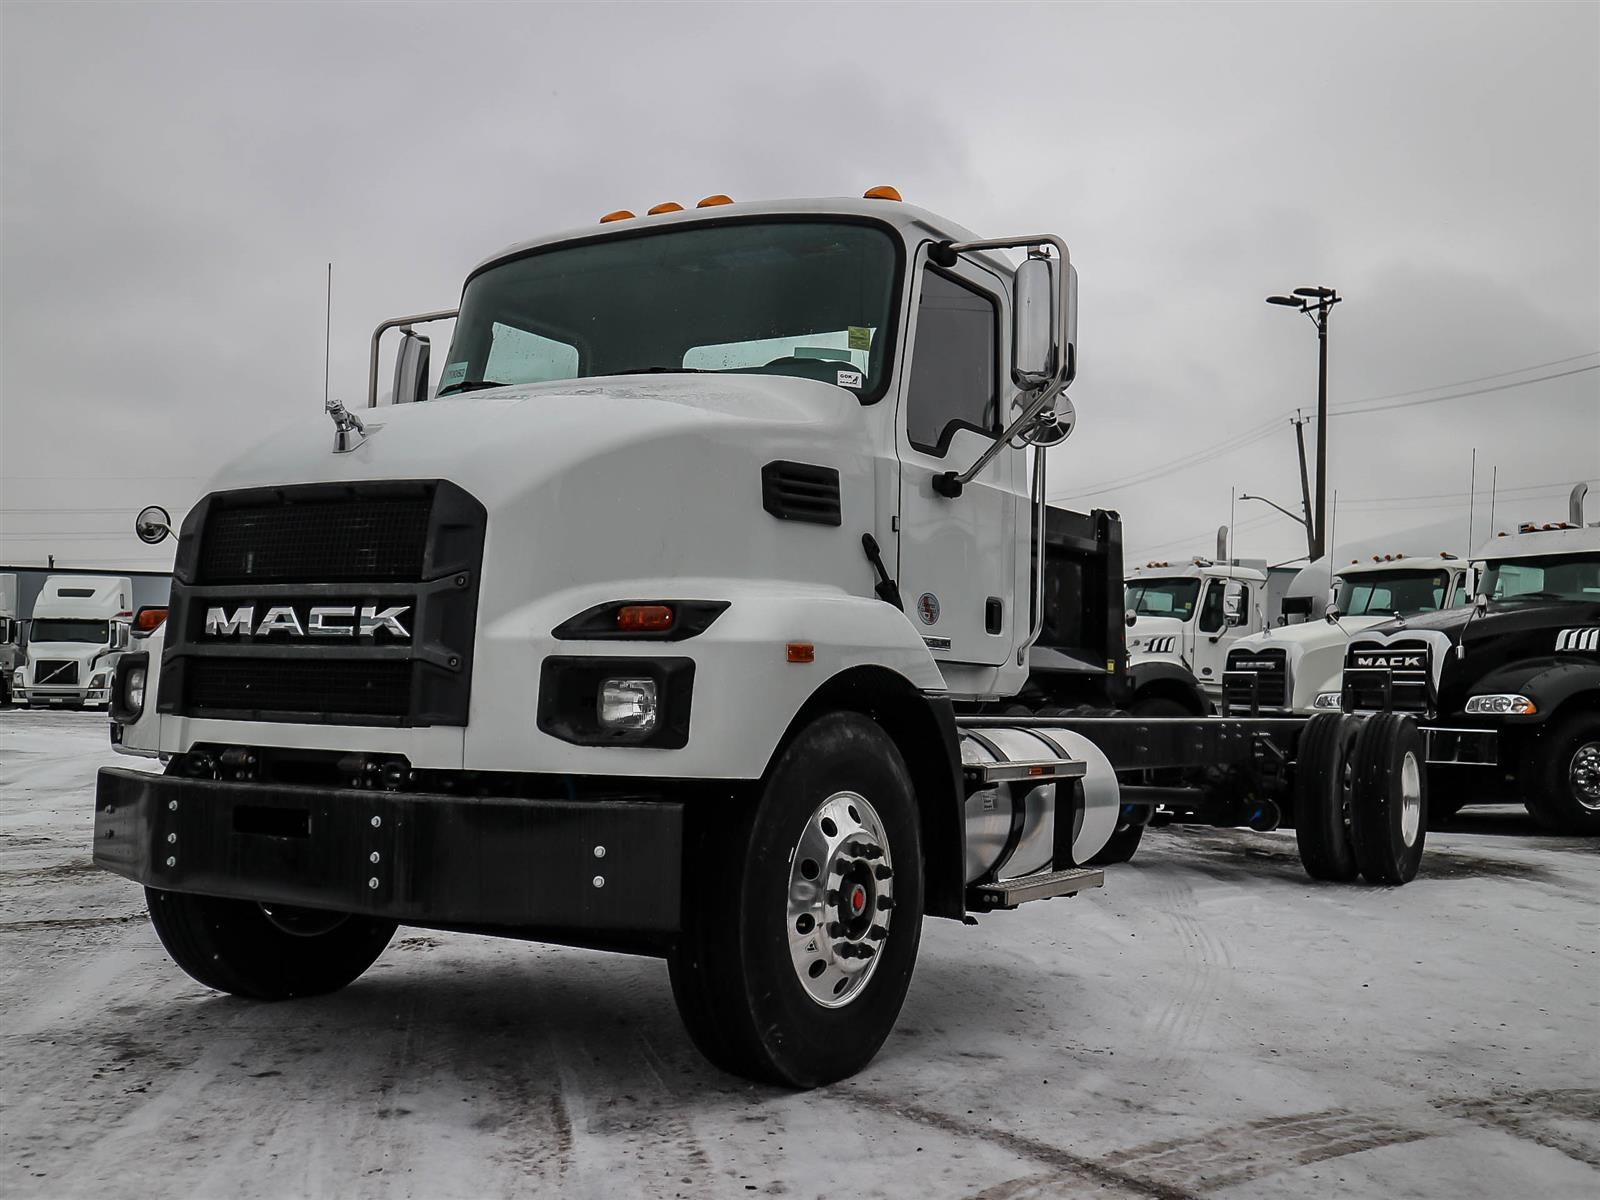 2021 Mack MD7 Image